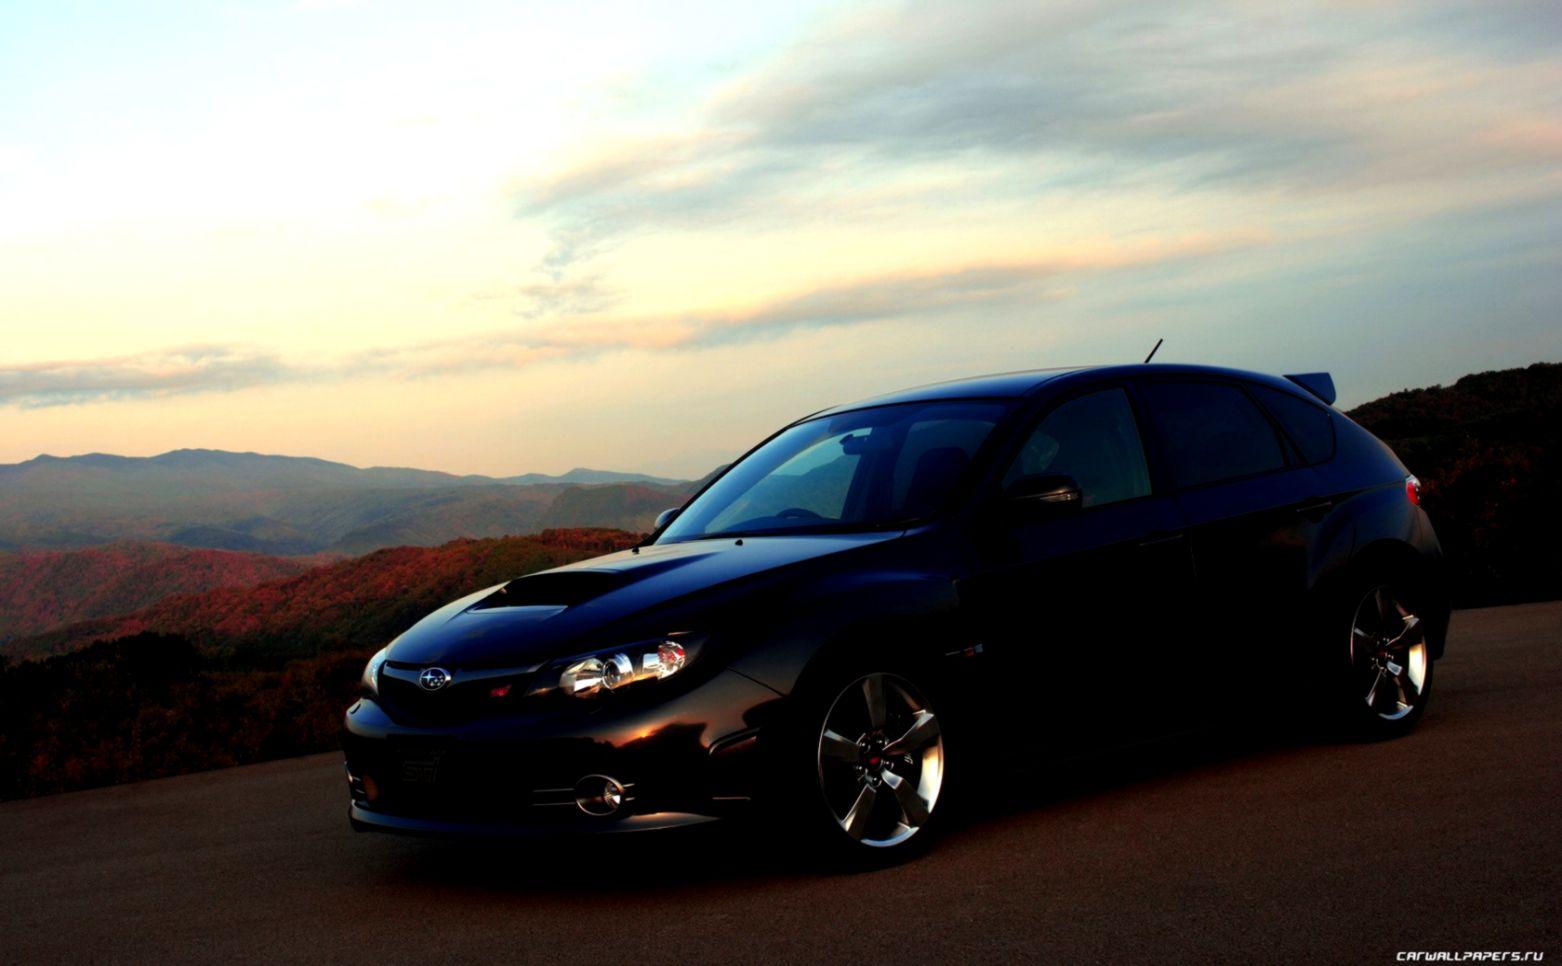 Subaru Impreza Wrx Sti Hd Wallpaper Wallpapers For Fun